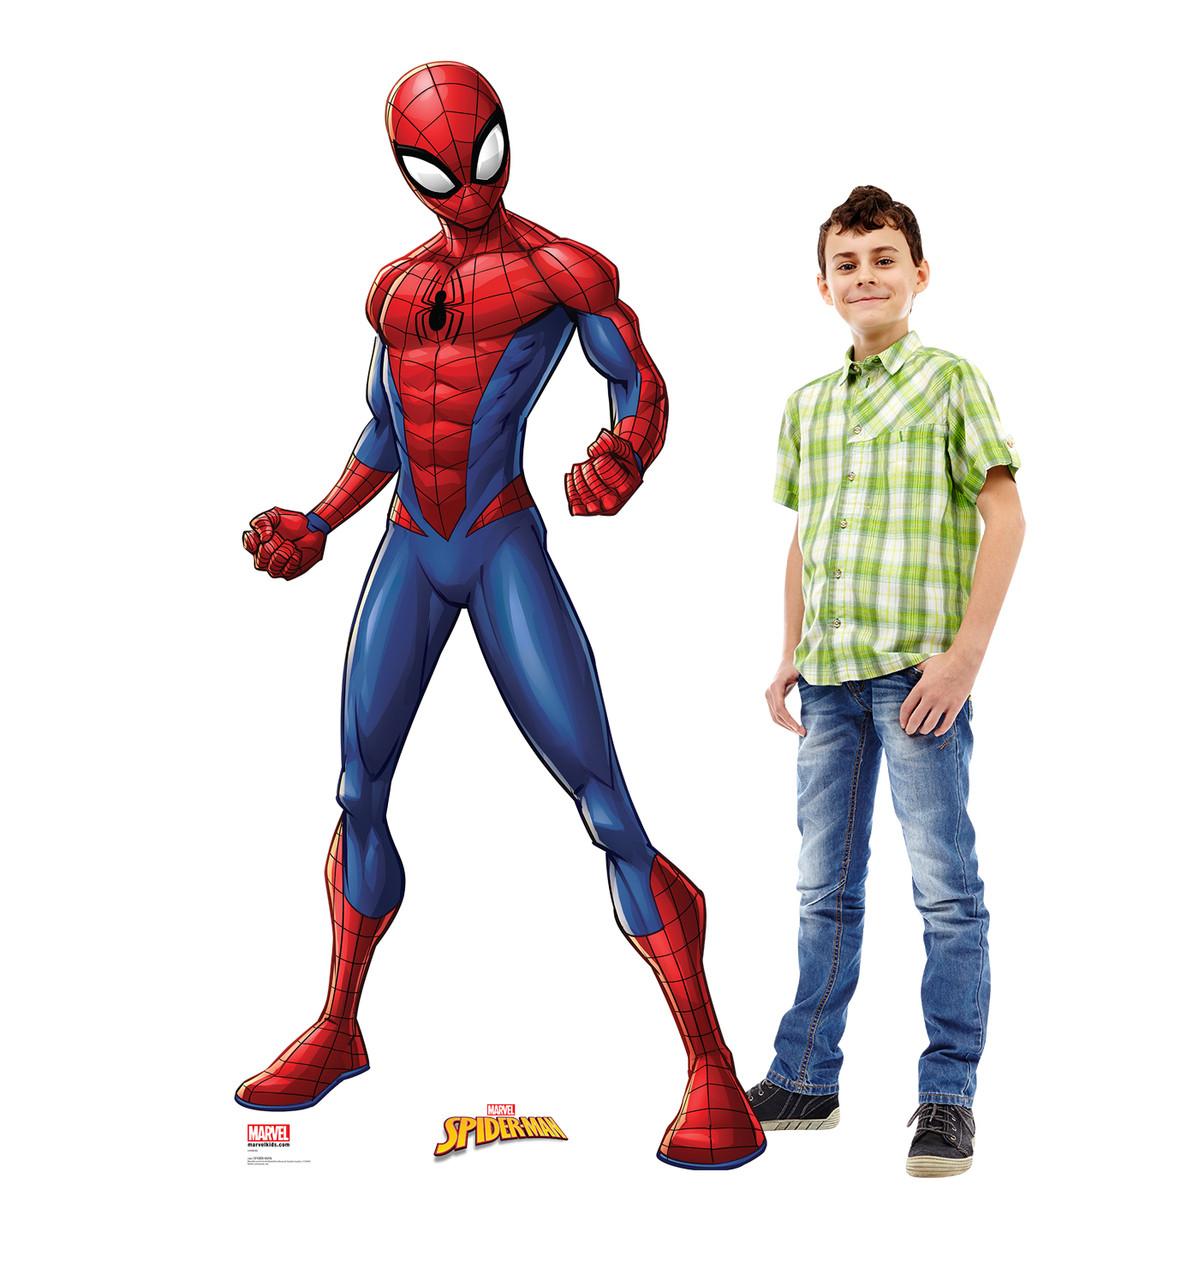 Life-size Spider-Man (Marvel Comics) Cardboard Standup 3